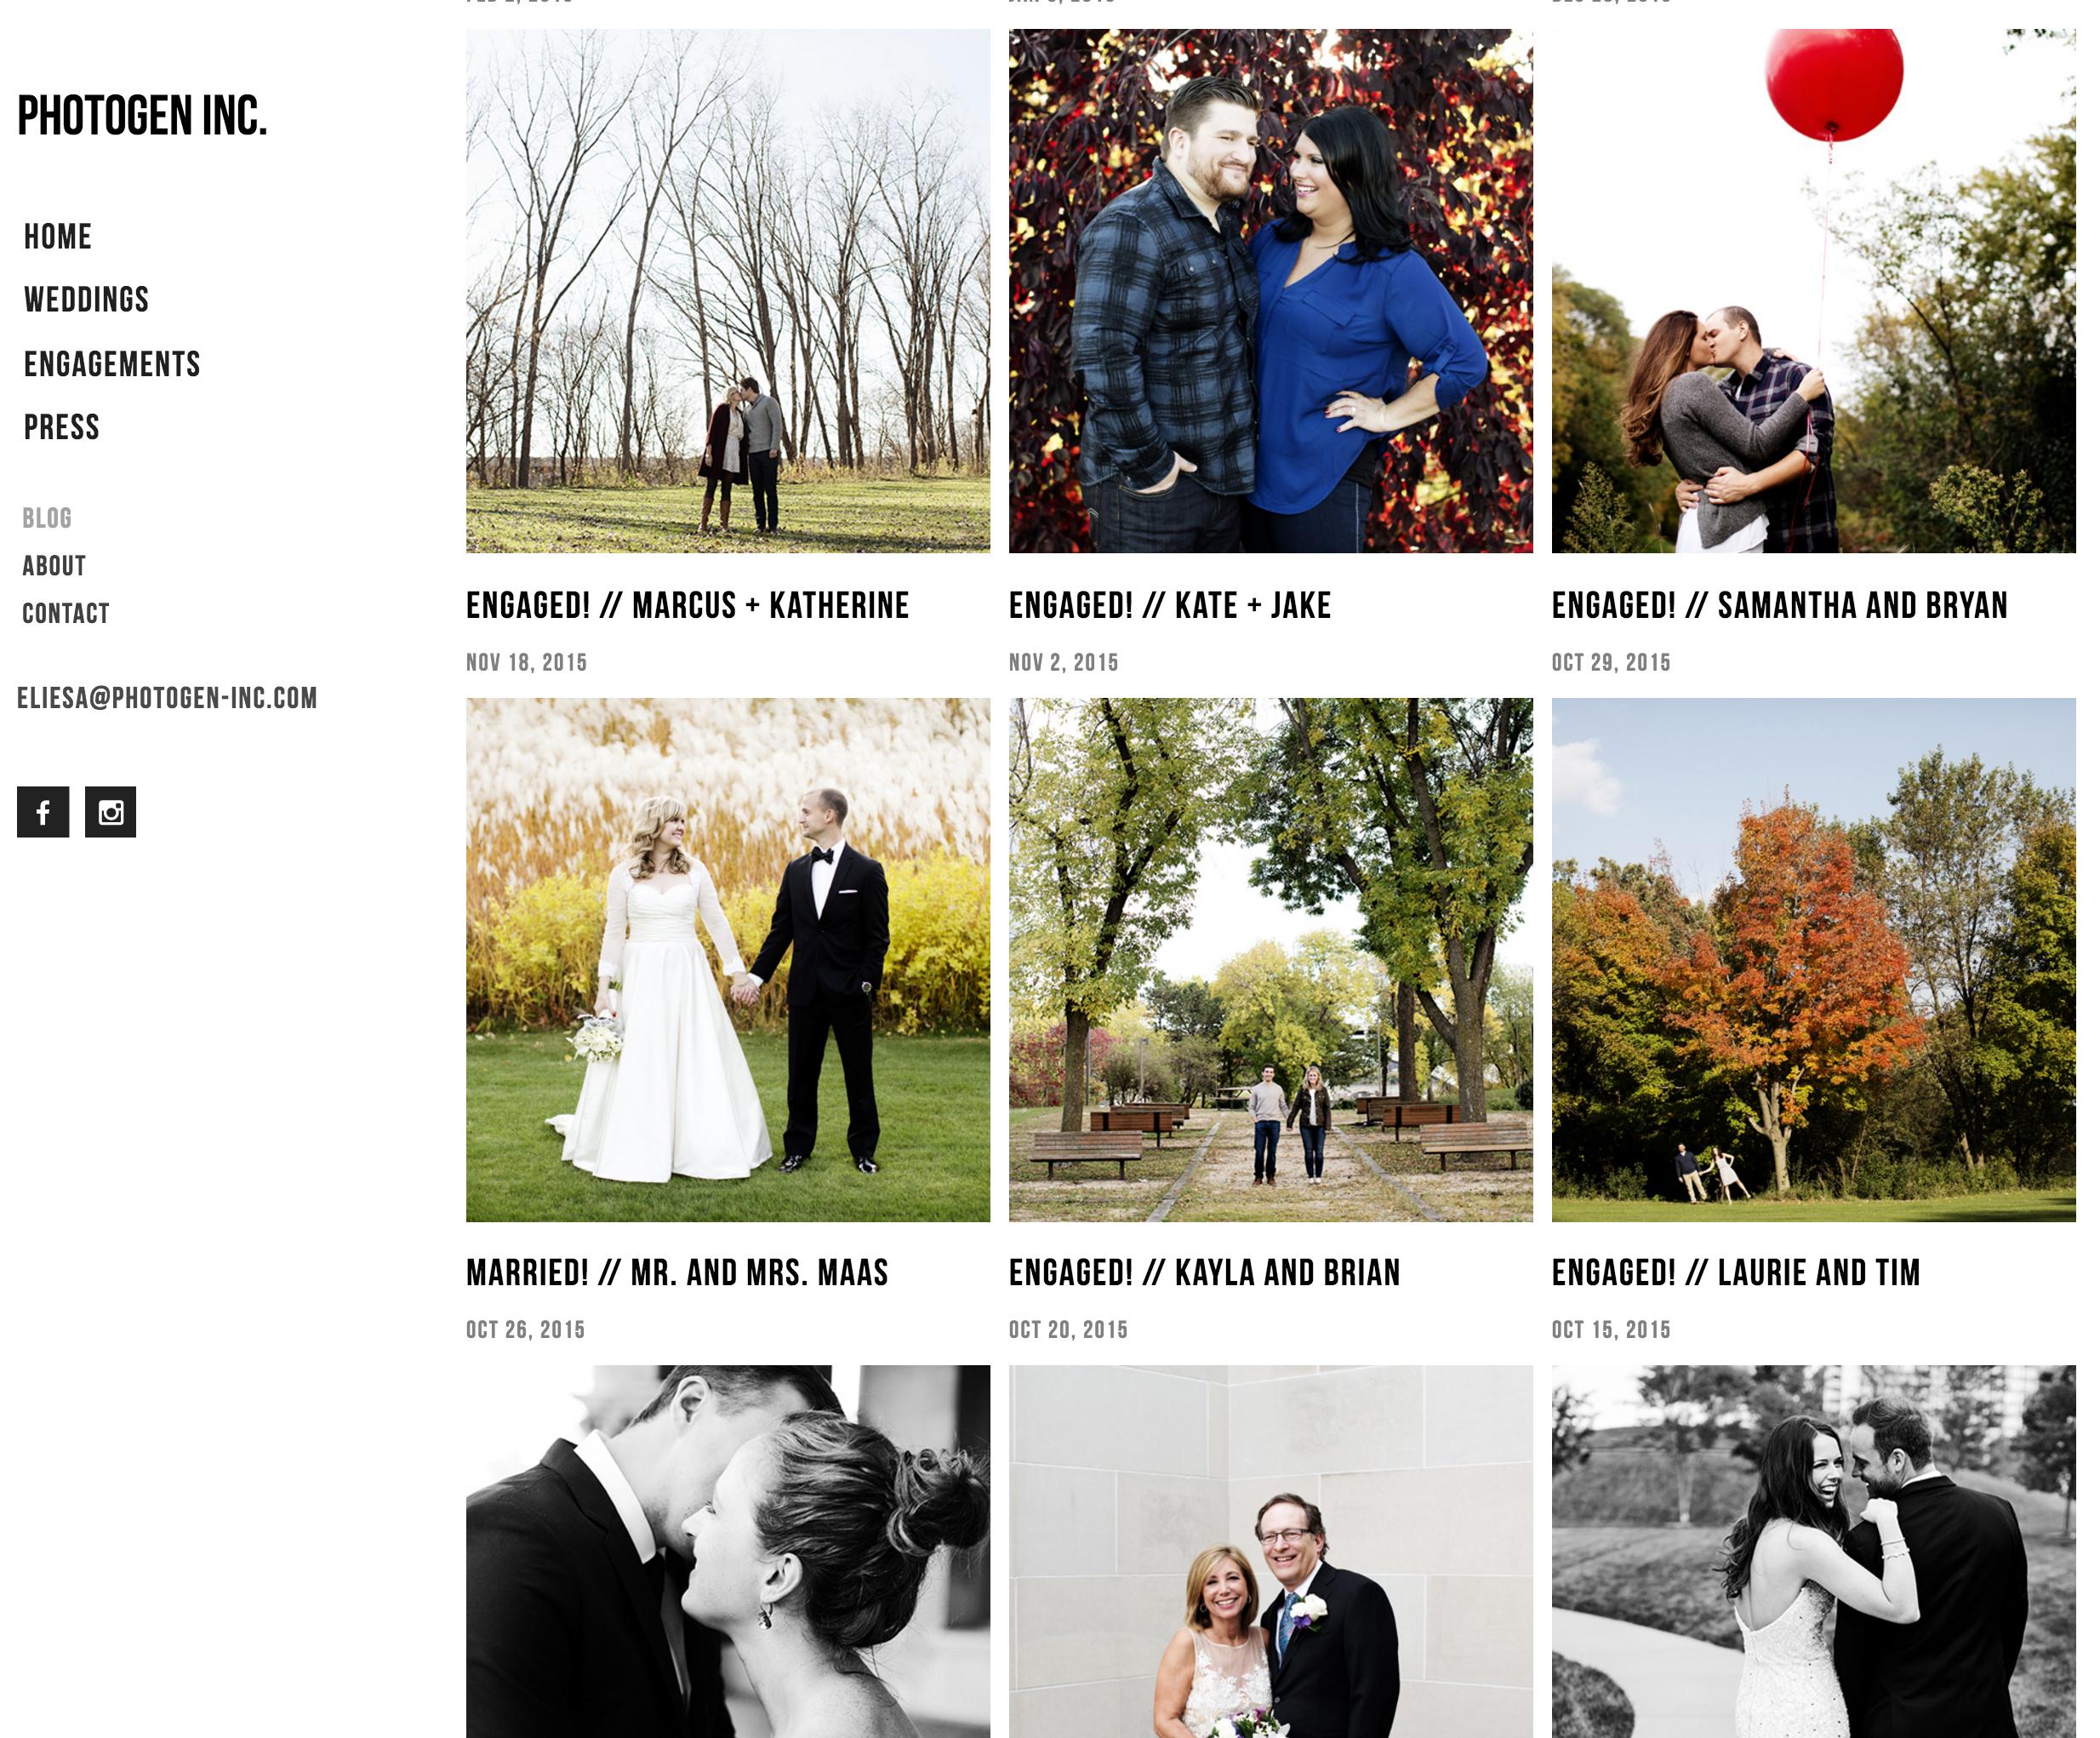 Minneapolis Wedding Photographer | Photogen Inc. | Eliesa Johnson